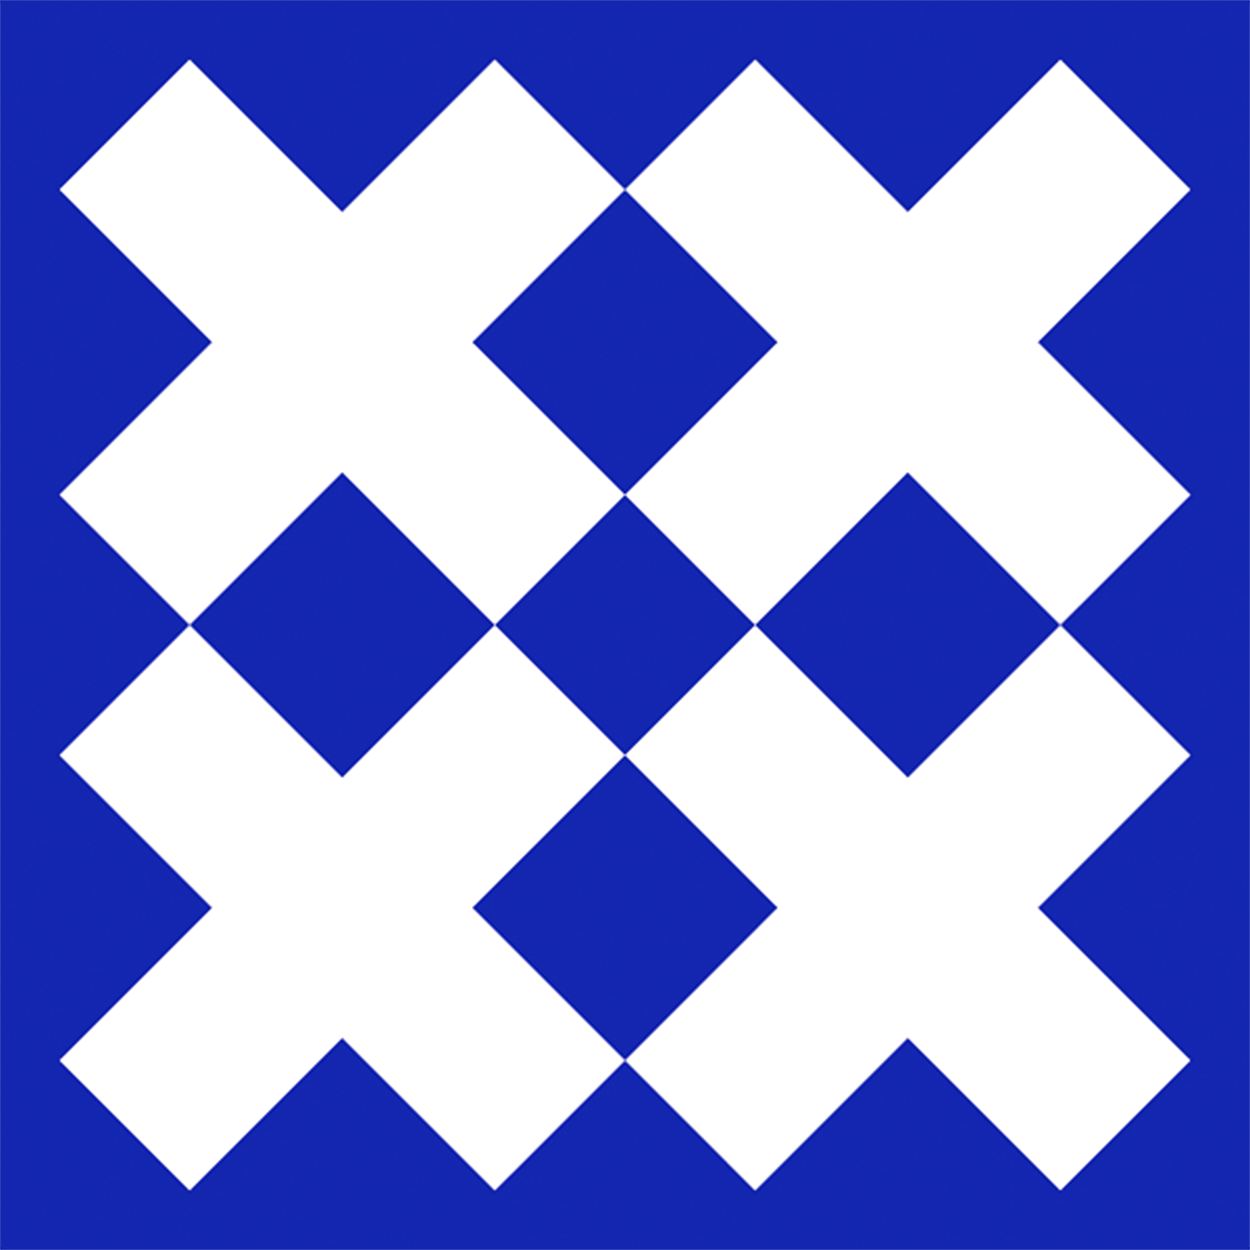 azulejo_7